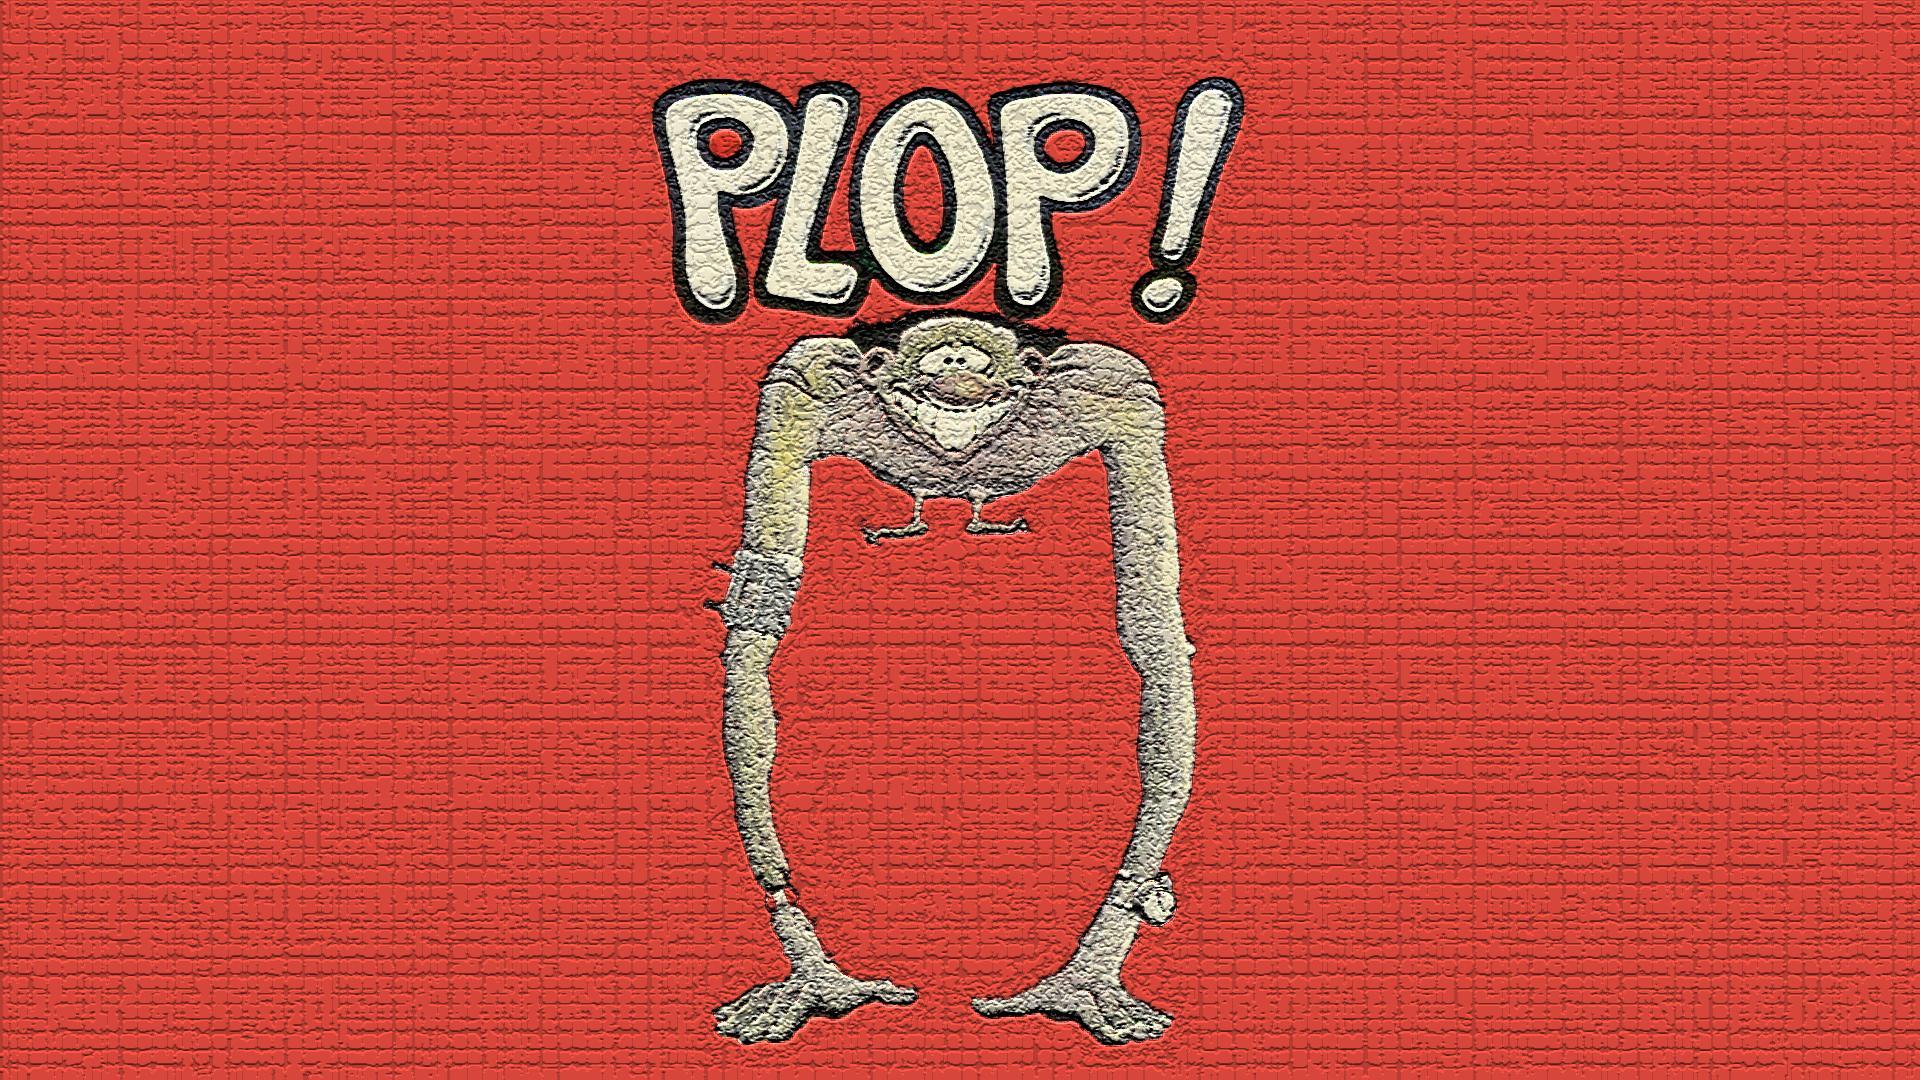 Plop! Comics wallpapers HD quality